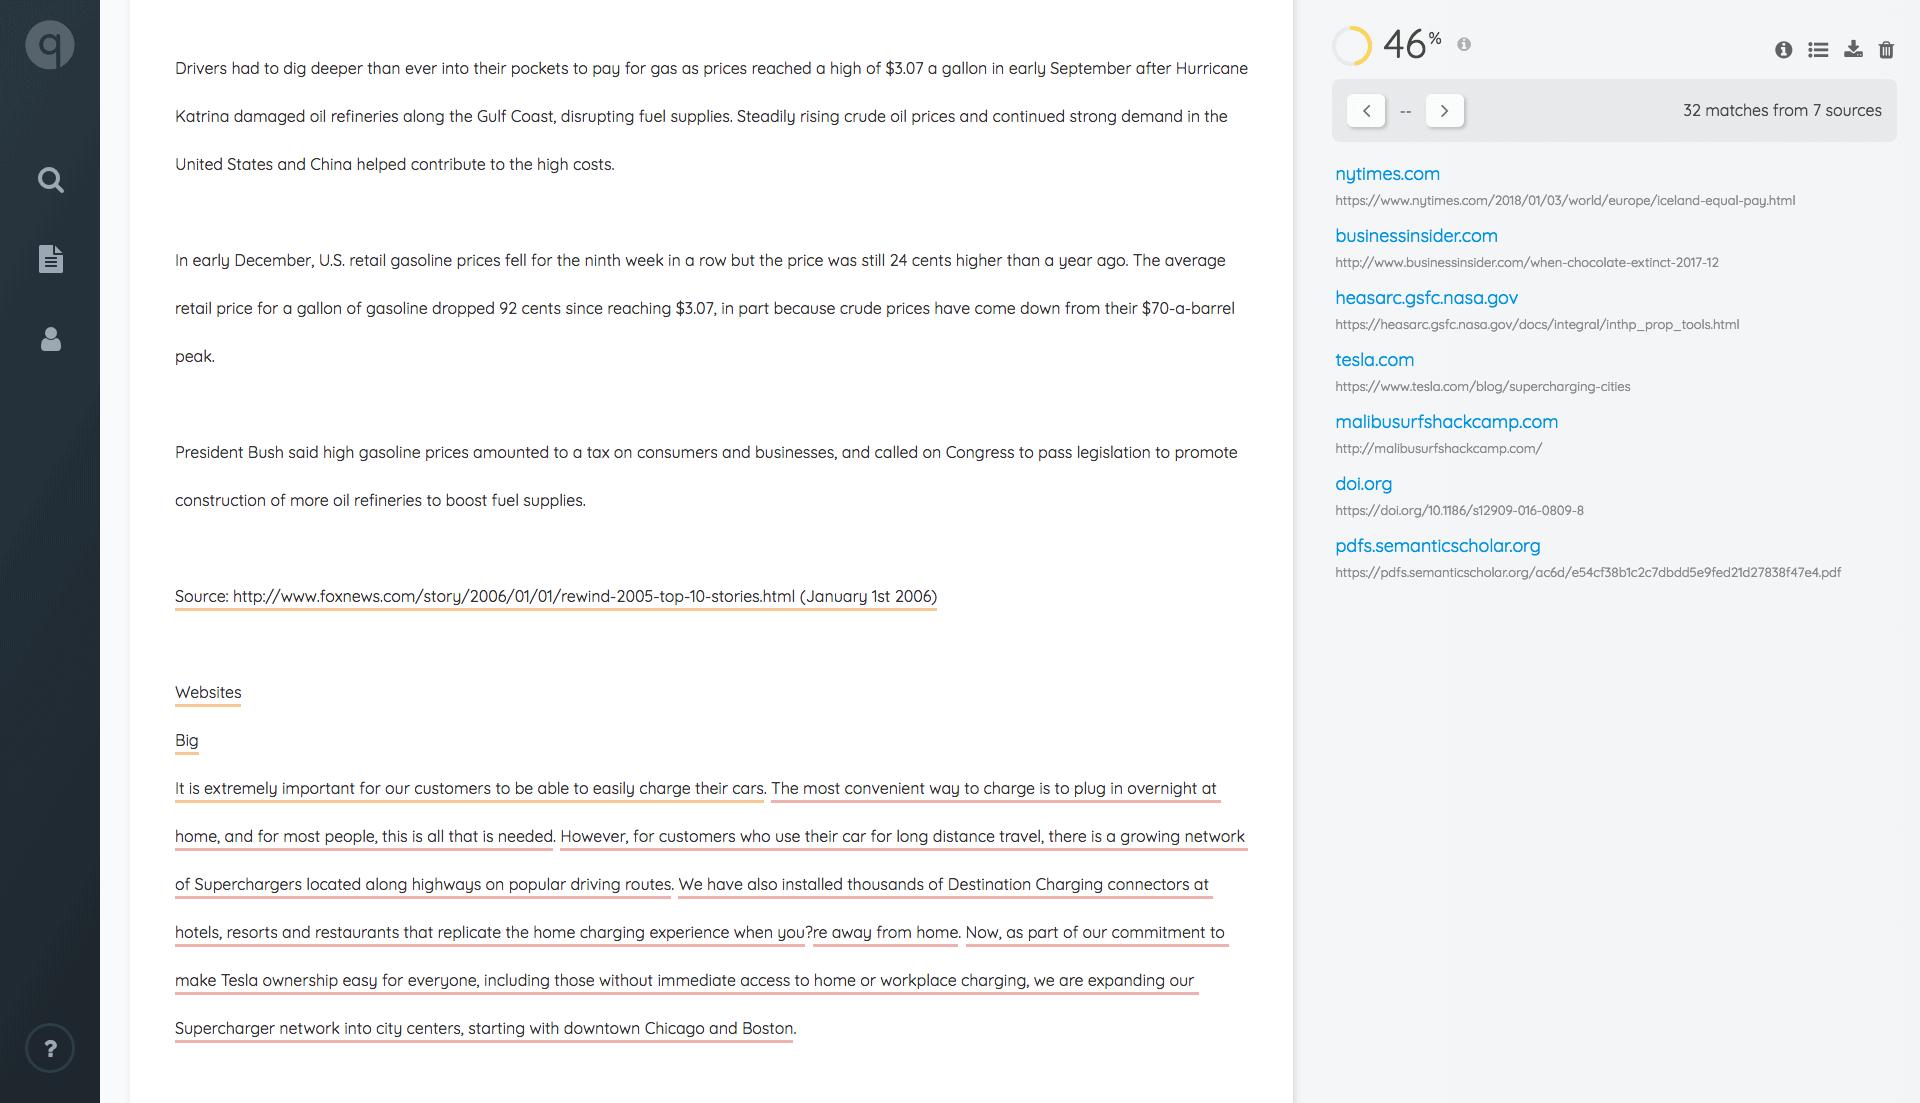 Quetext Plagiarism Checker report